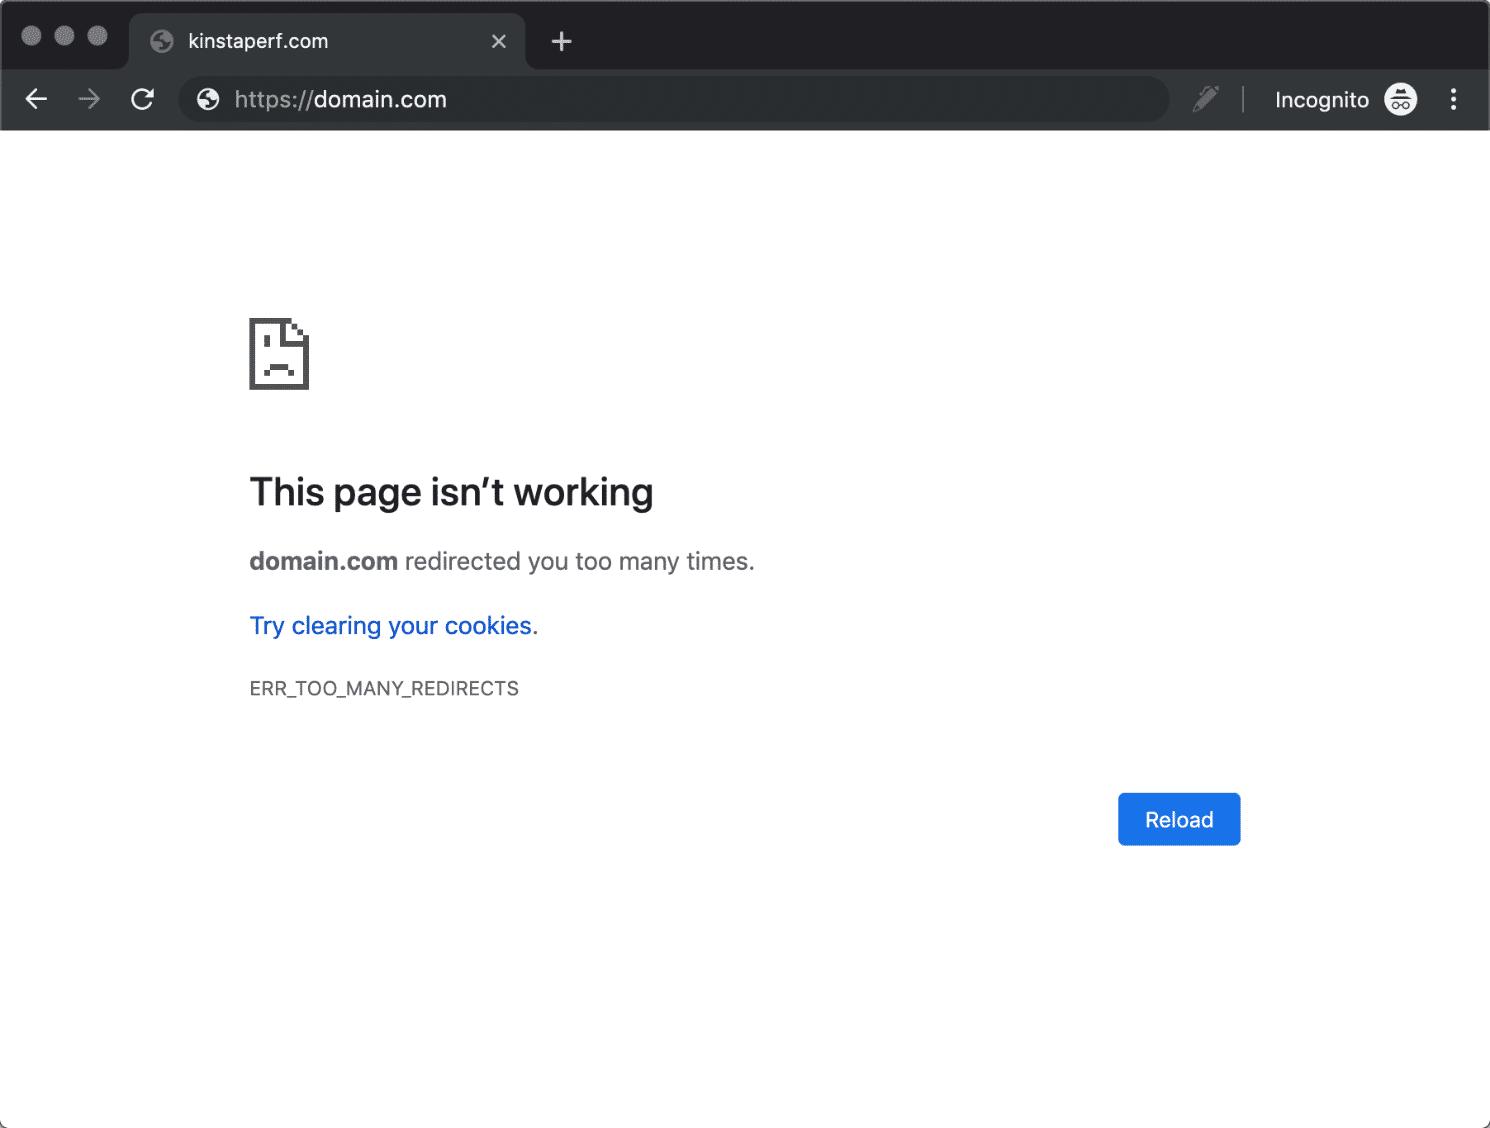 Google ChromeのERR_TOO_MANY_REDIRECTS